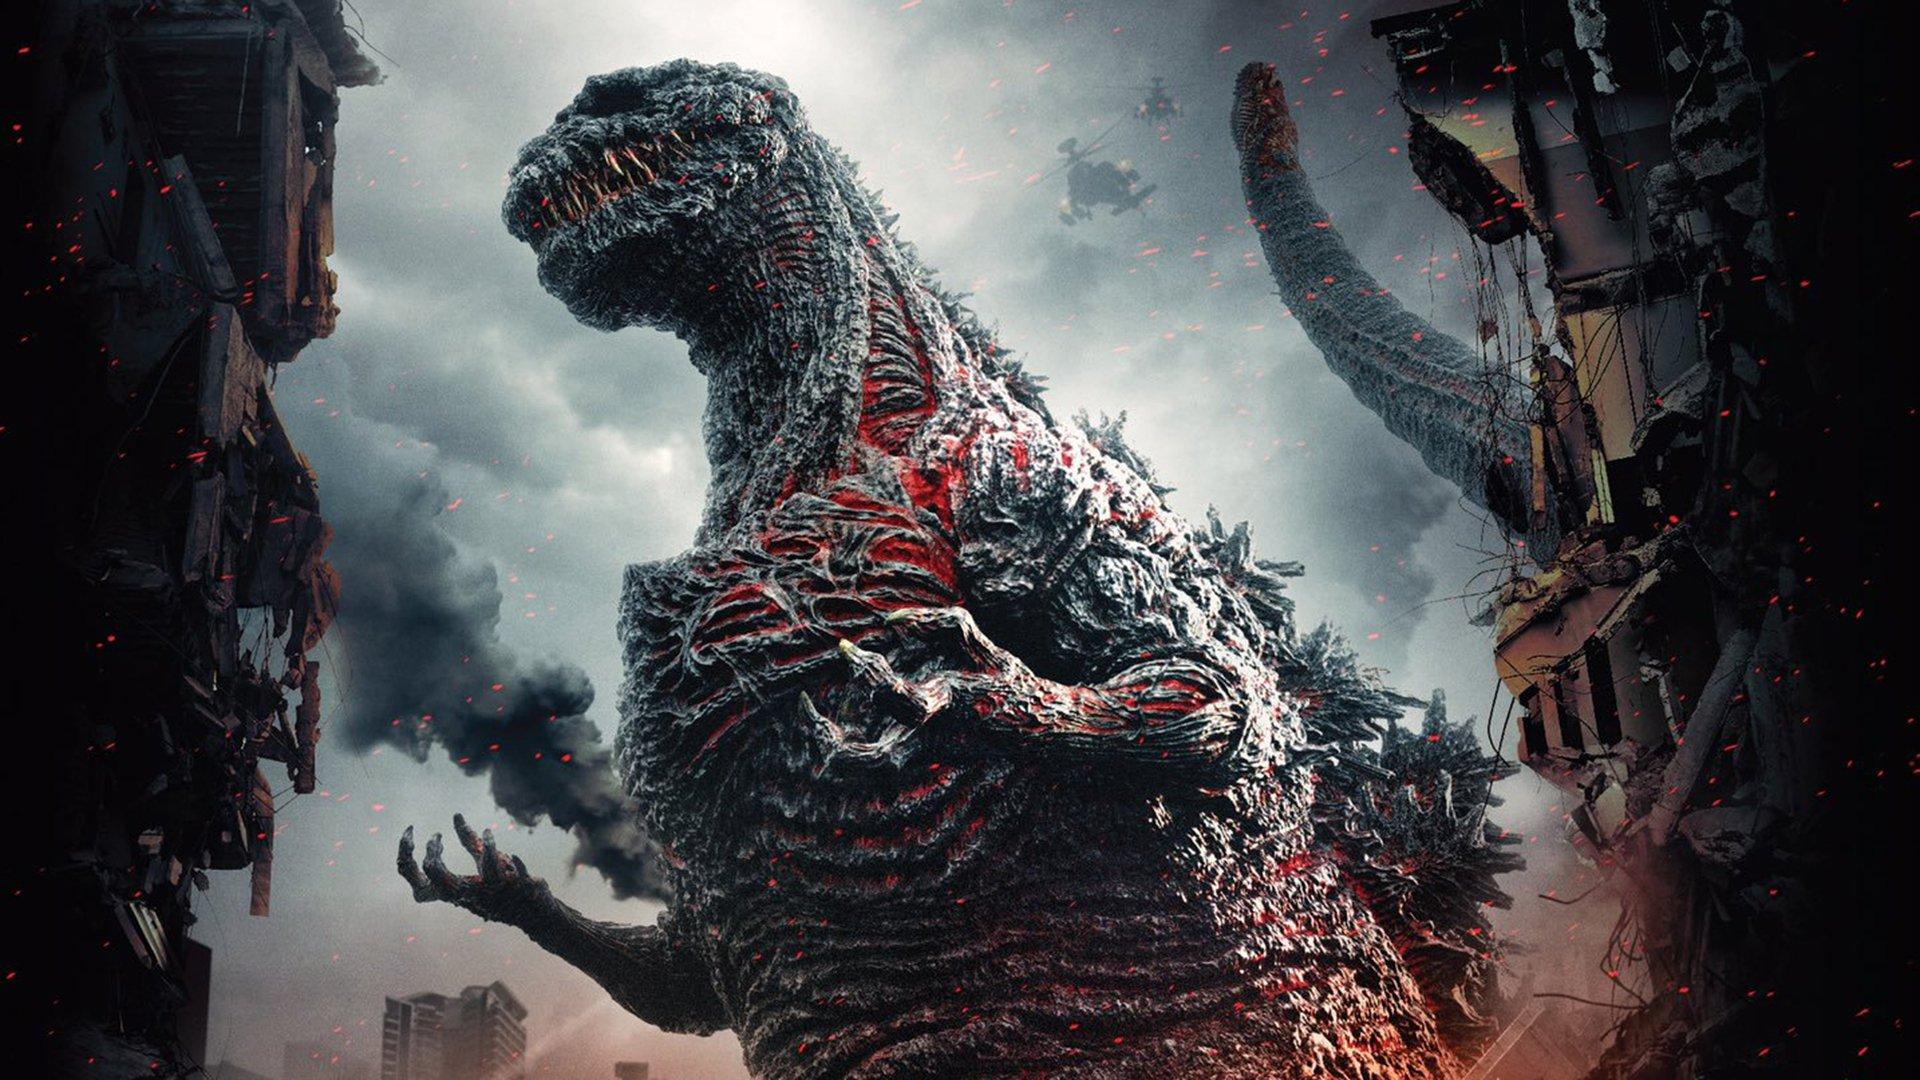 Godzilla with ferocious new redesign in Shin Godzilla (2016)